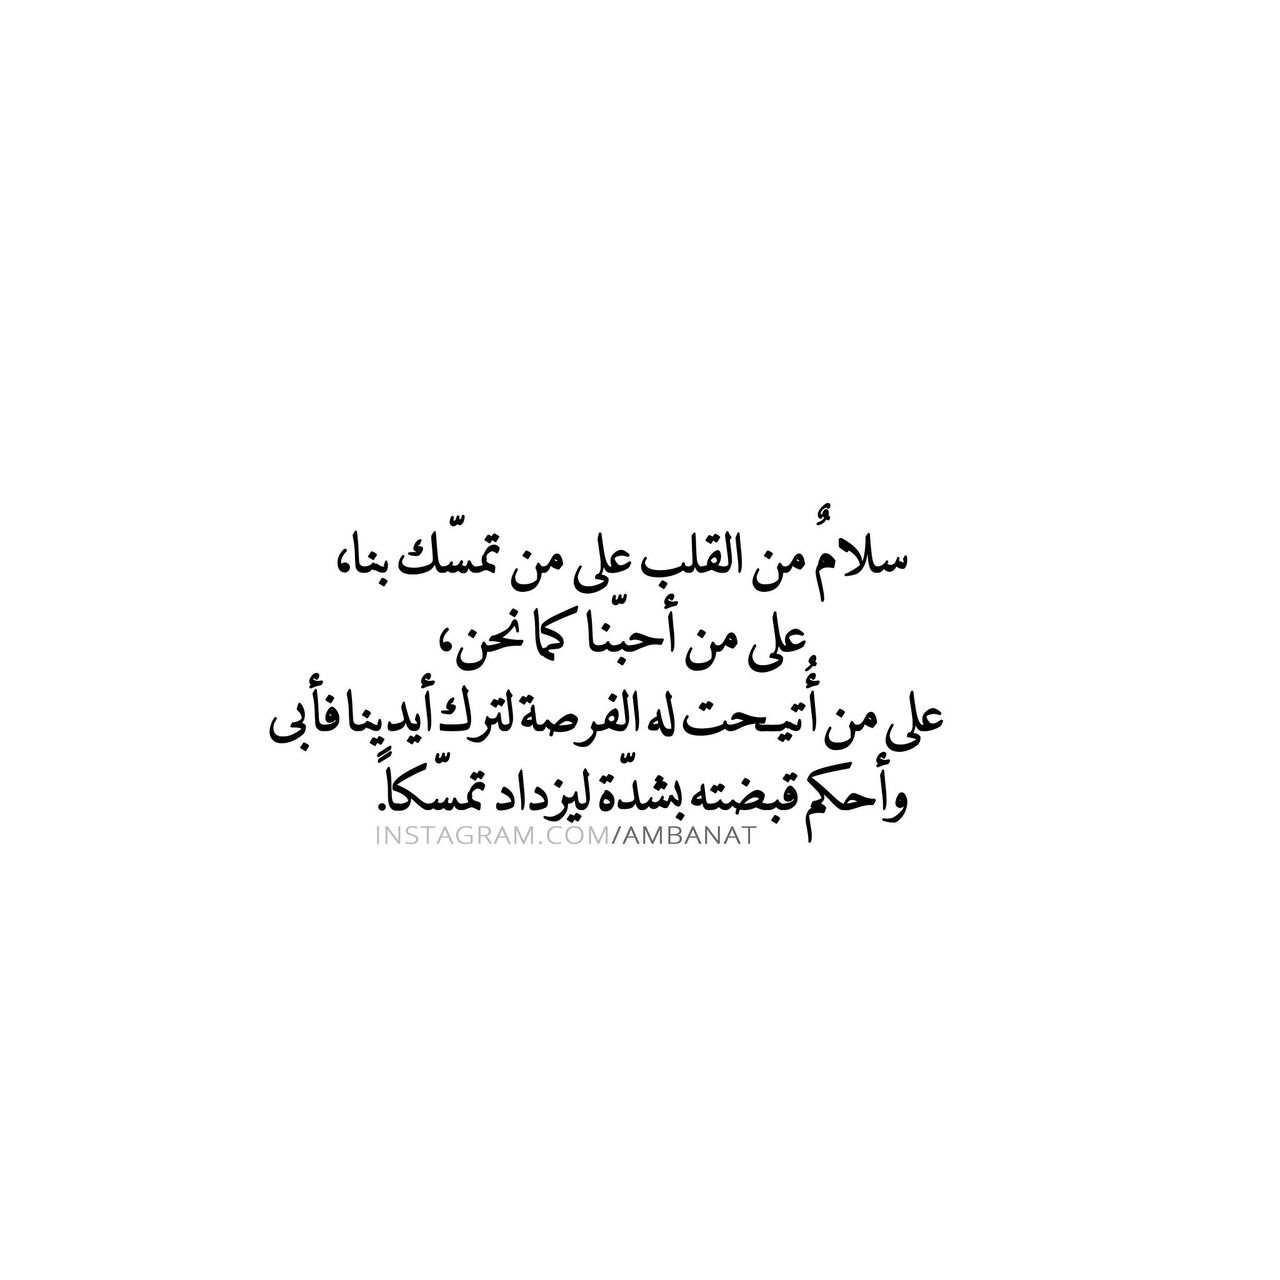 سلام على أهل السلام السلام عليكم Words Quotes Wisdom Quotes Life Wisdom Quotes